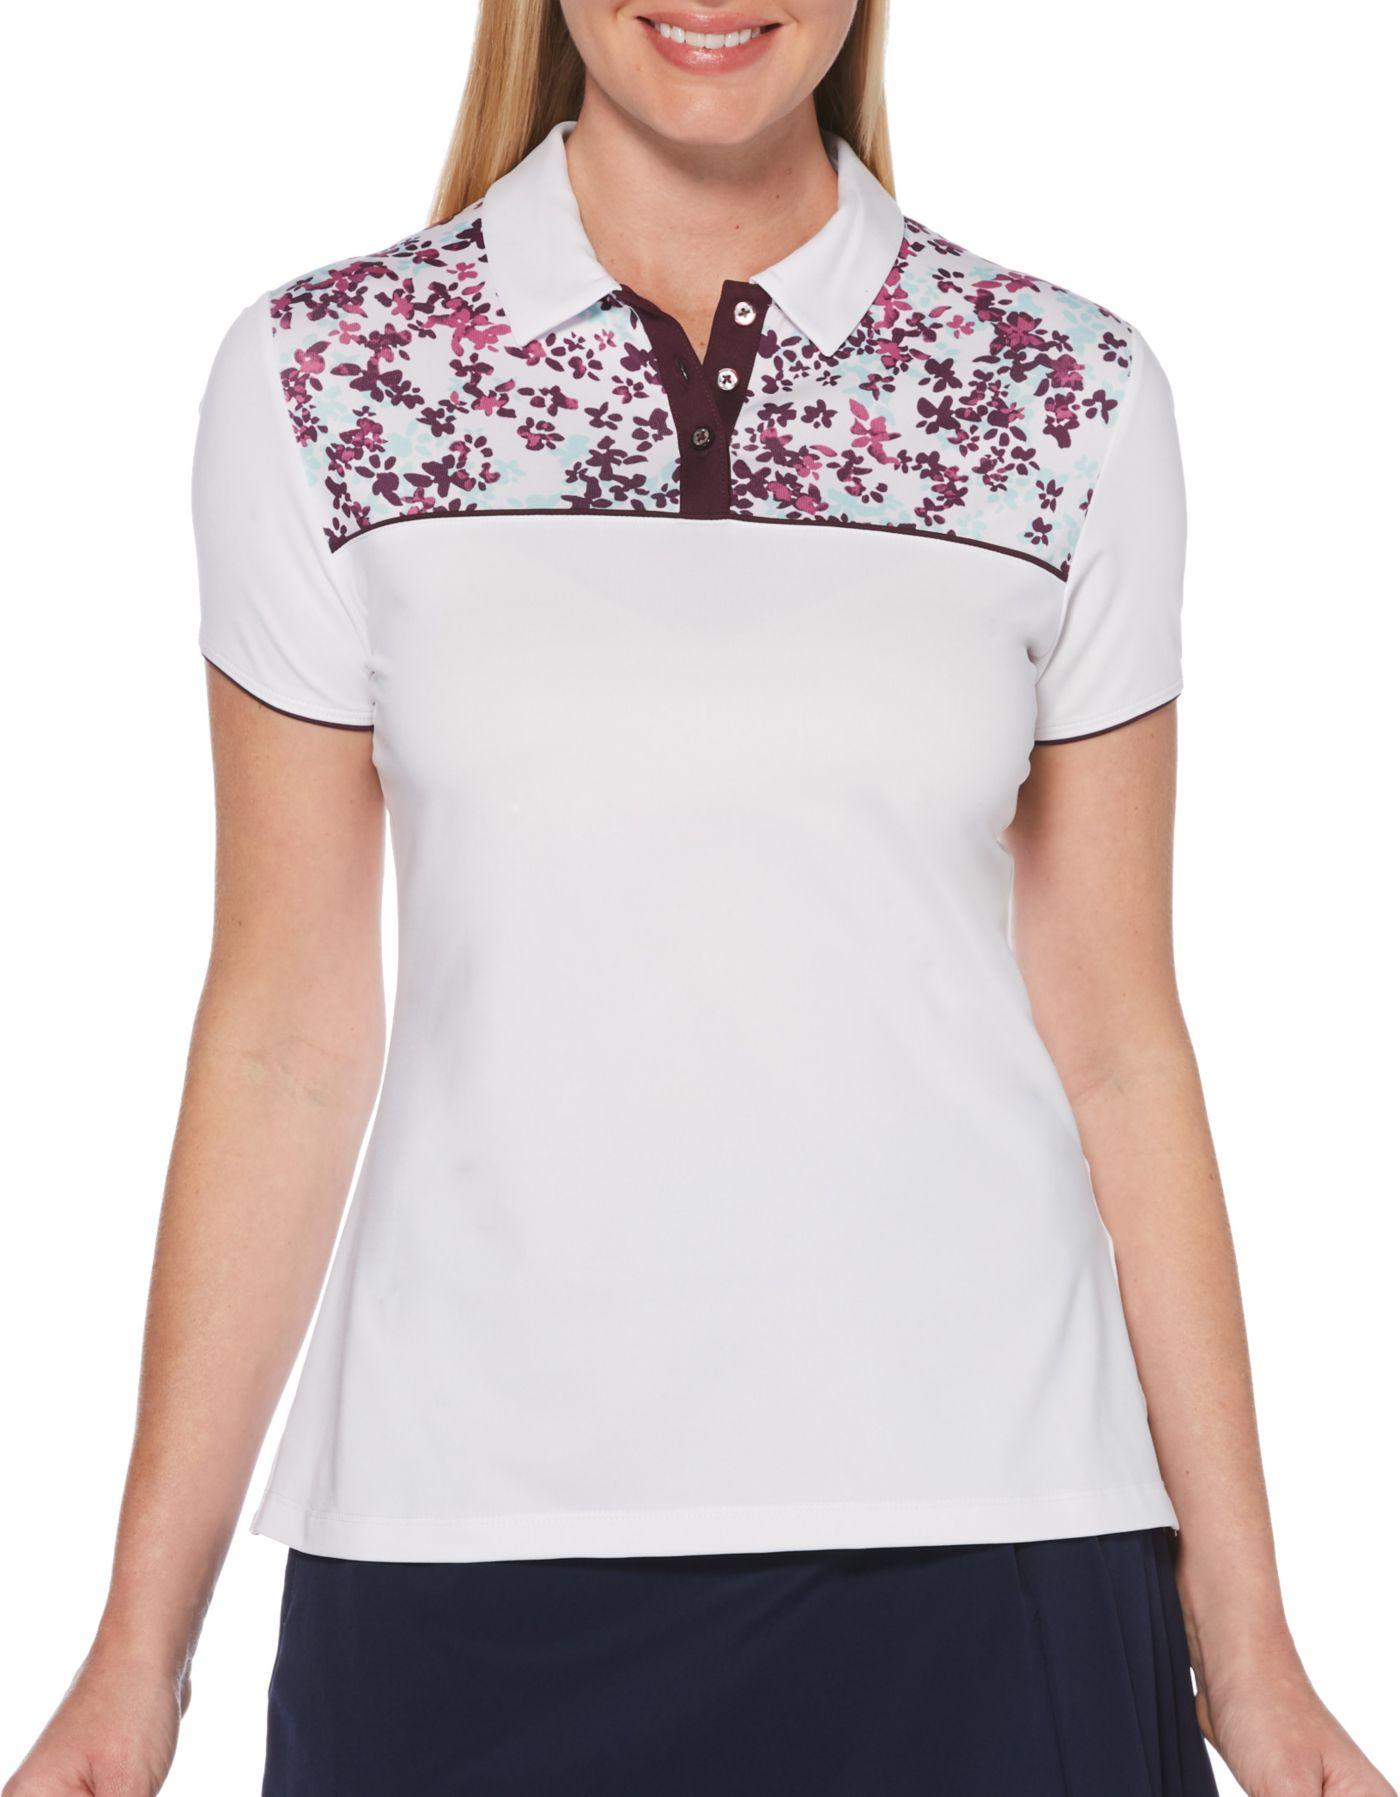 Callaway Women's Confetti Floral Print Short Sleeve Golf Polo